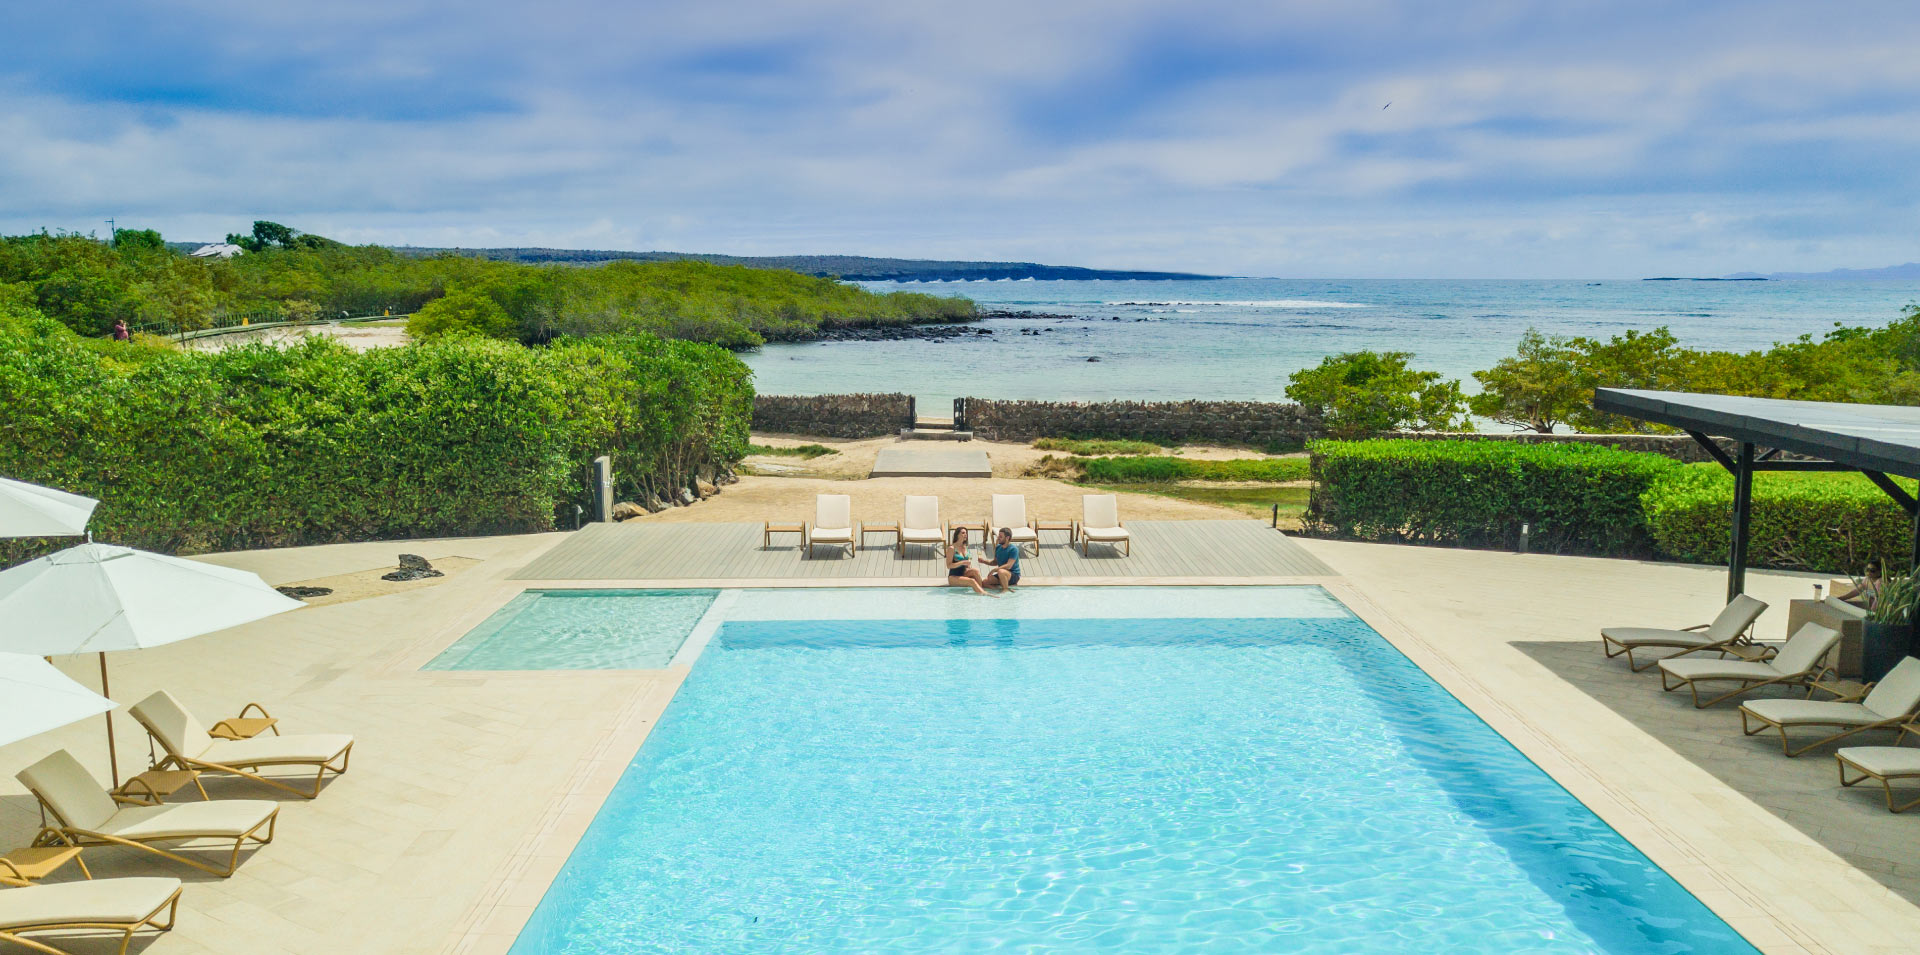 Finch Bay Galapagos Hotel pool and beach entrance